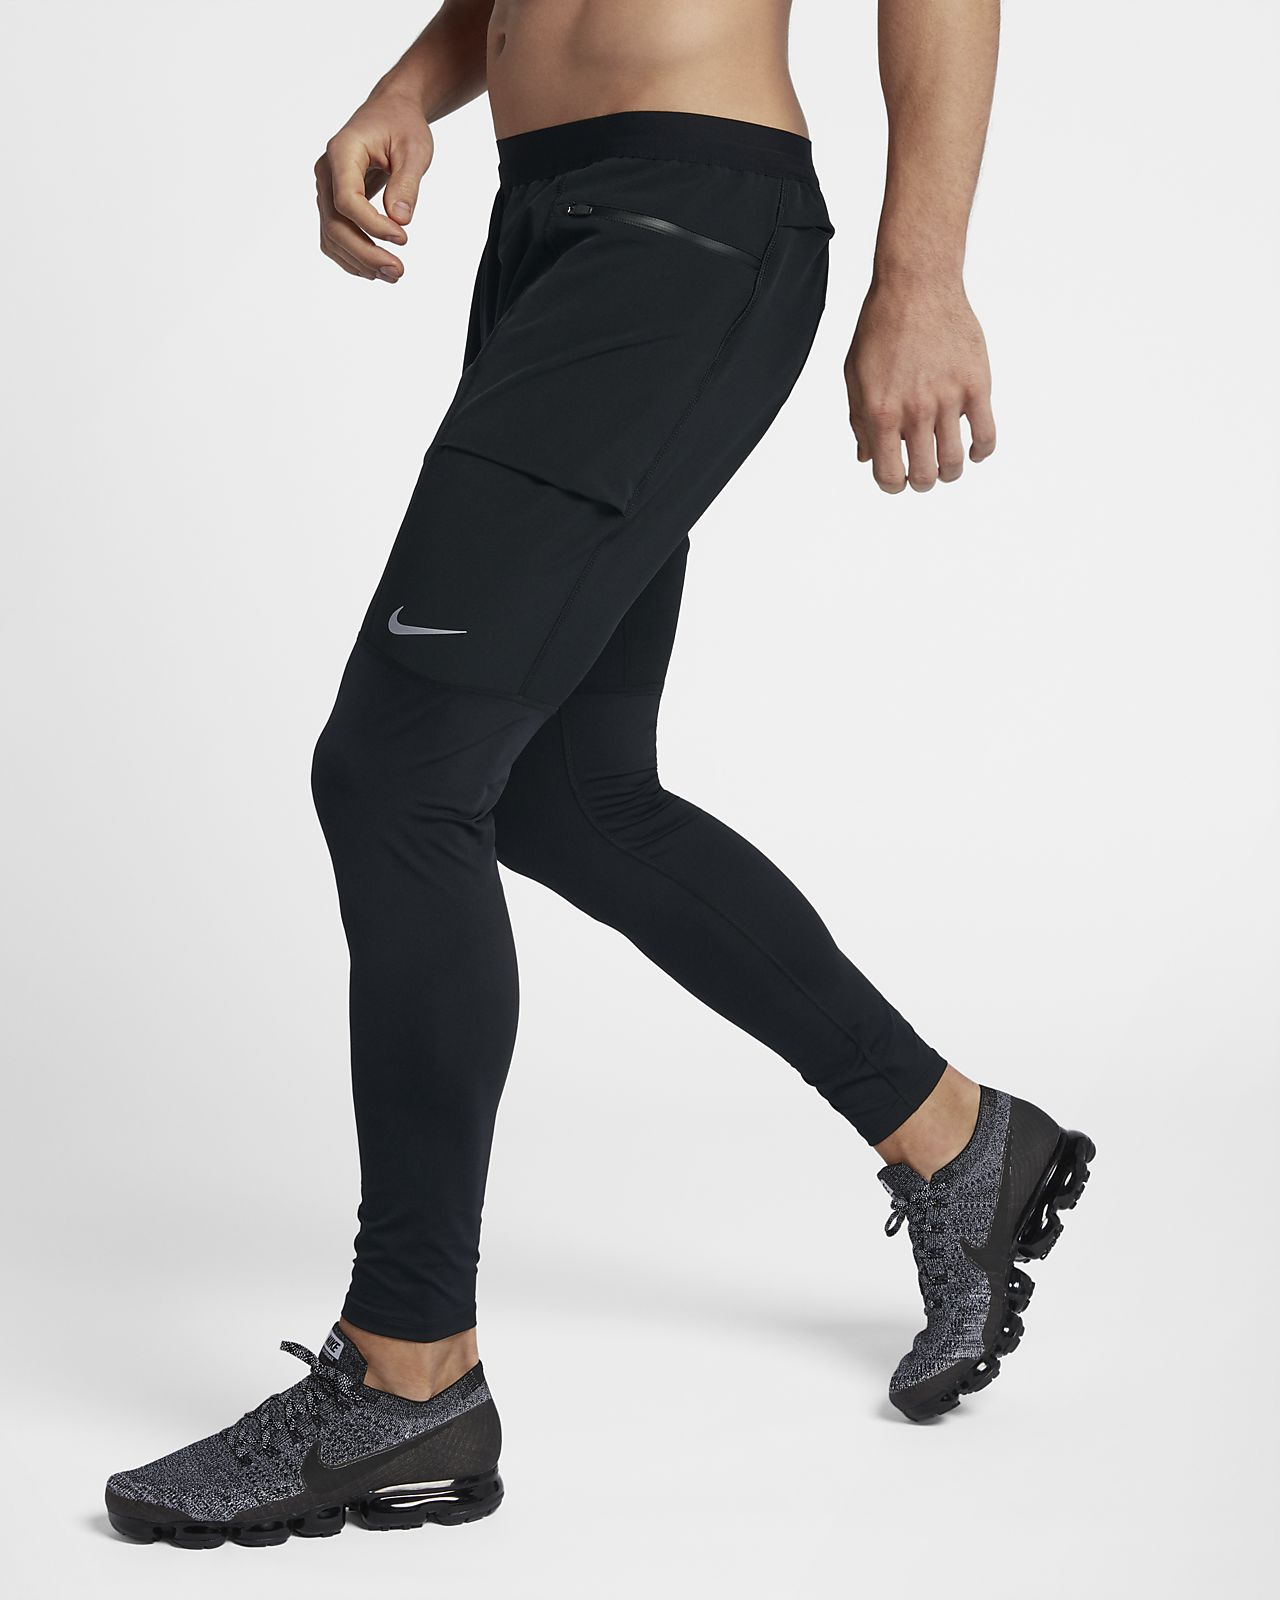 28f3bb789a Pantaloni da running Nike Utility - Uomo. Nike.com IT